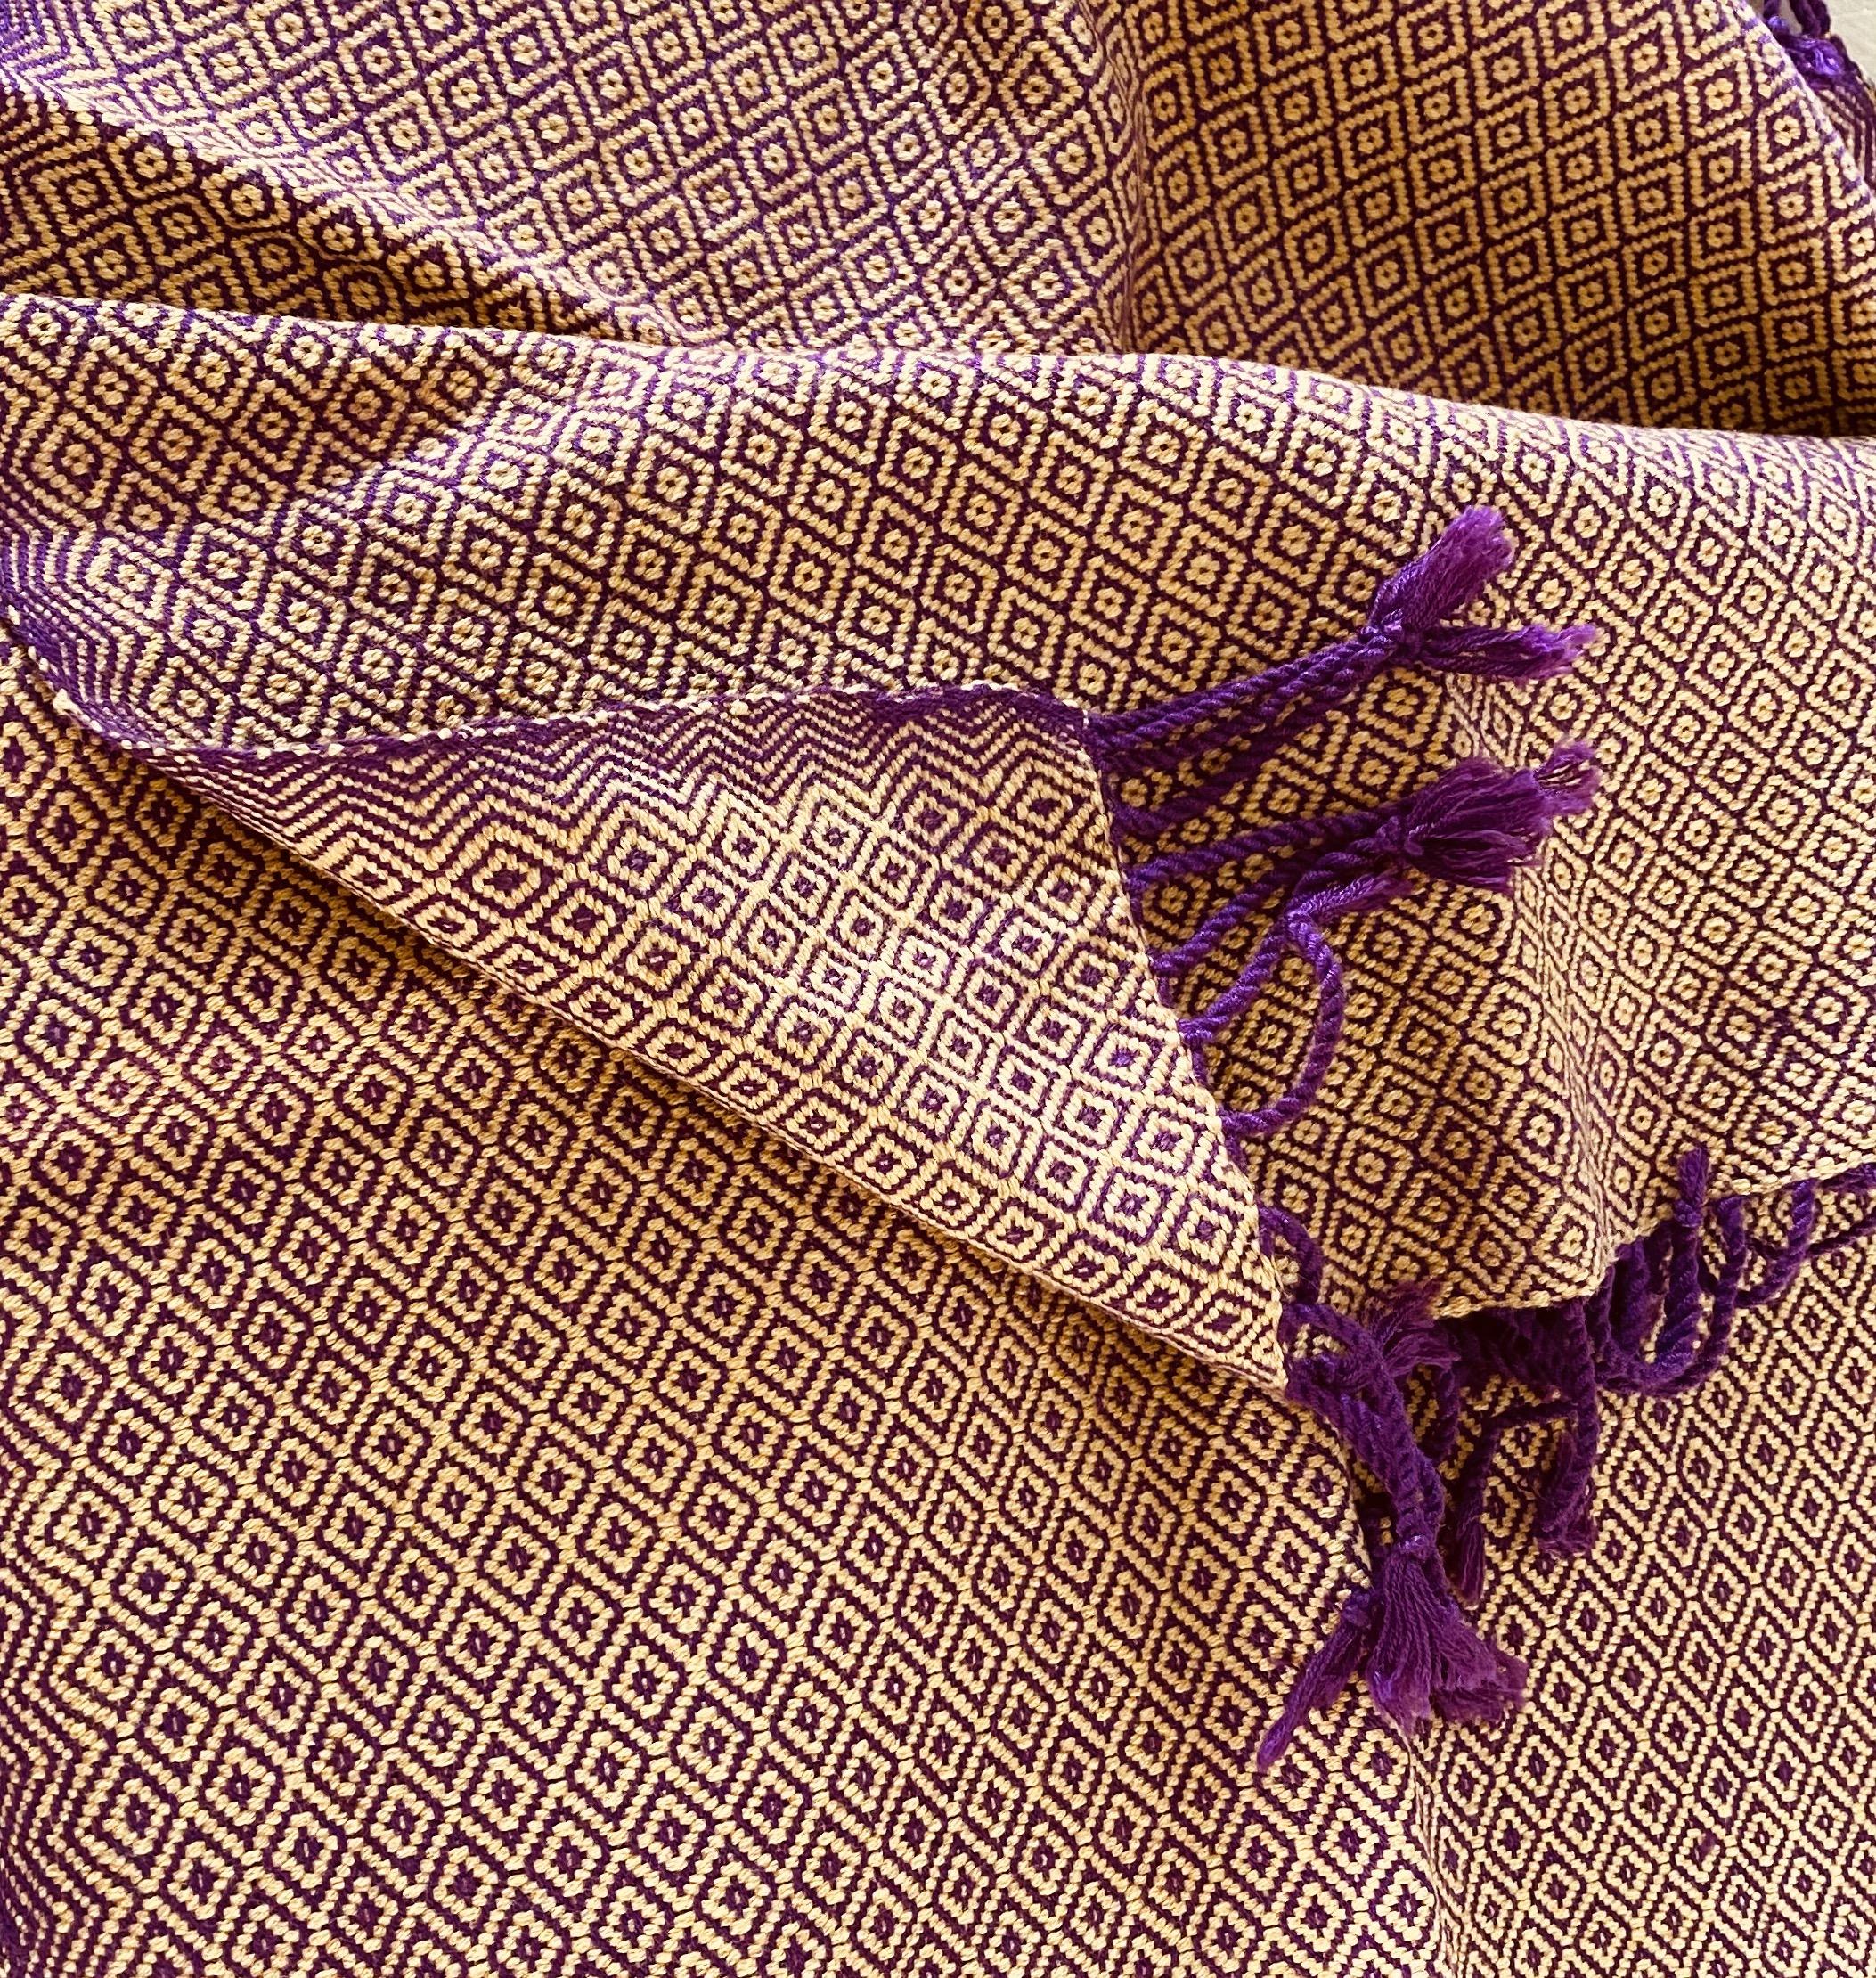 Oker en paarse sjaal in diamant patroon